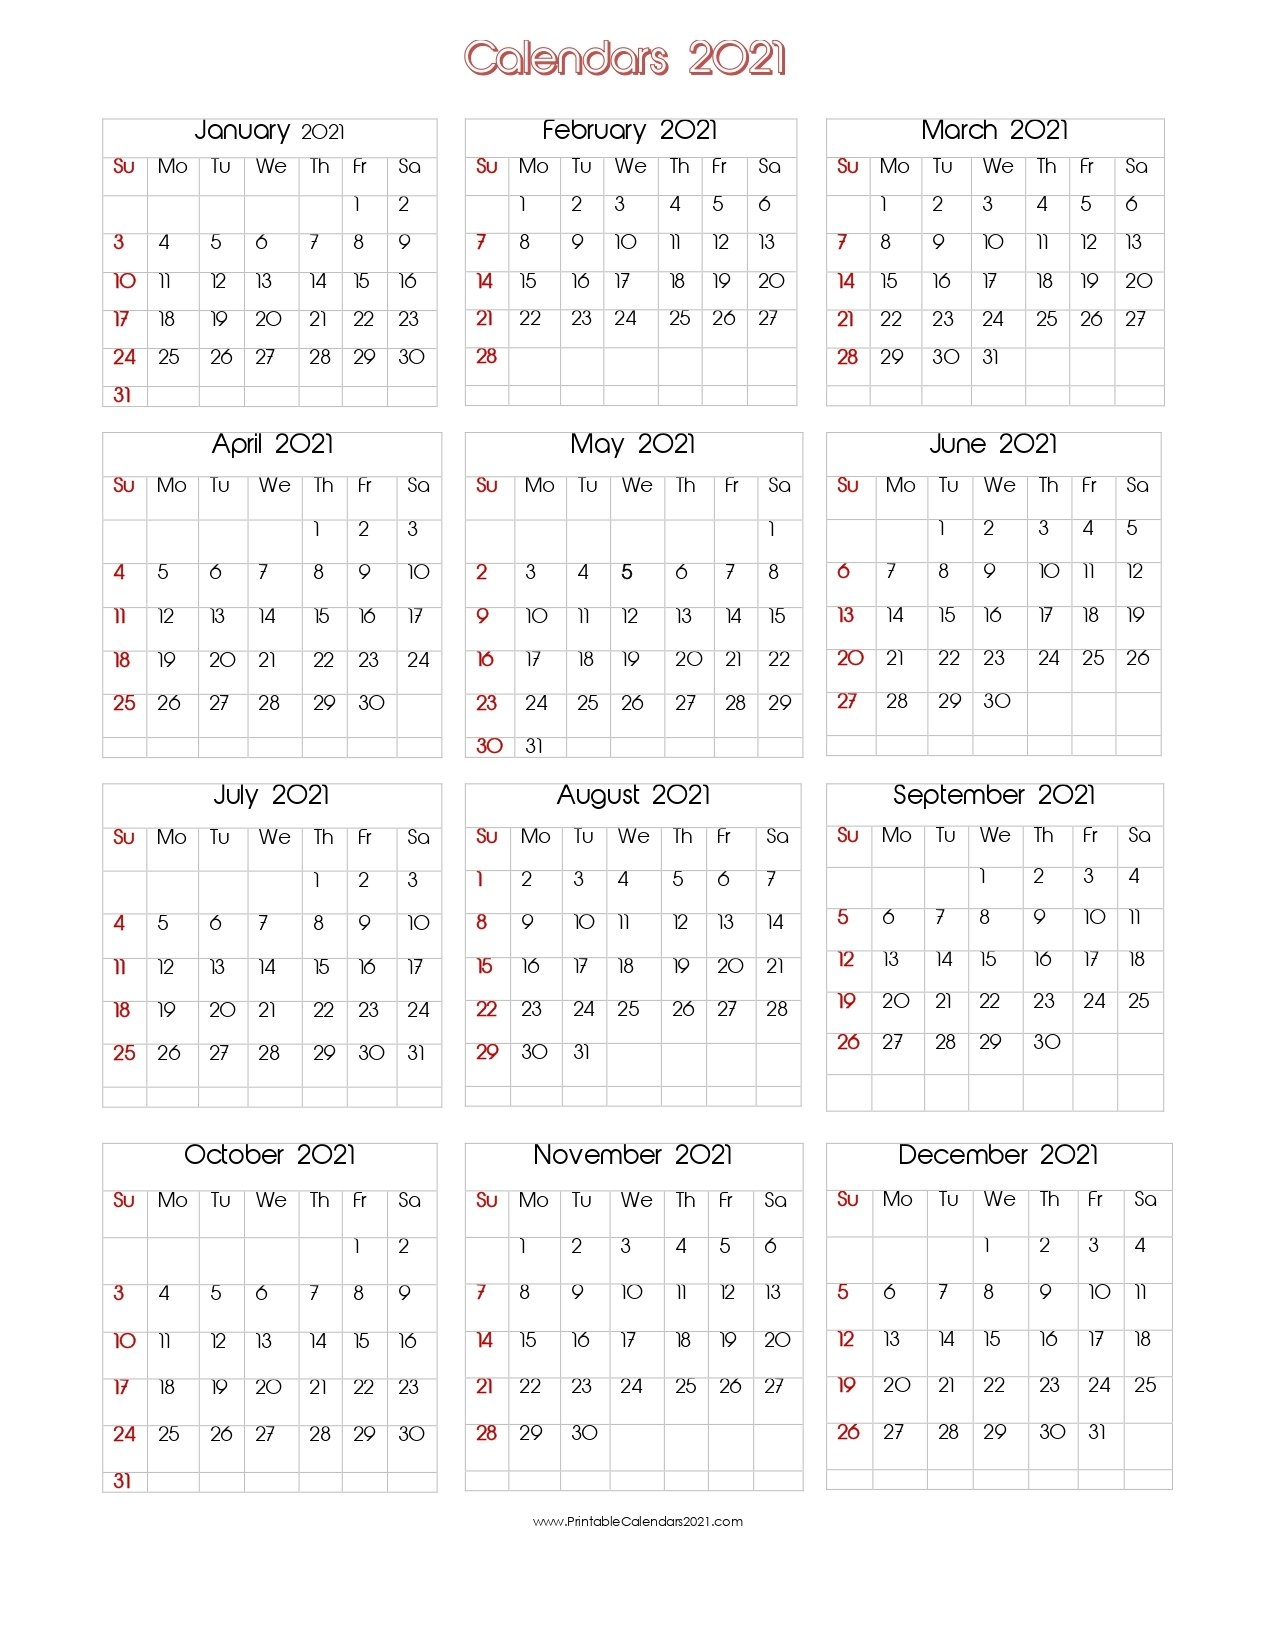 56+ Printable Calendar 2021 One Page, Printable 2021 Yearly Calendar inside One Page2021 Calendar Printable Images